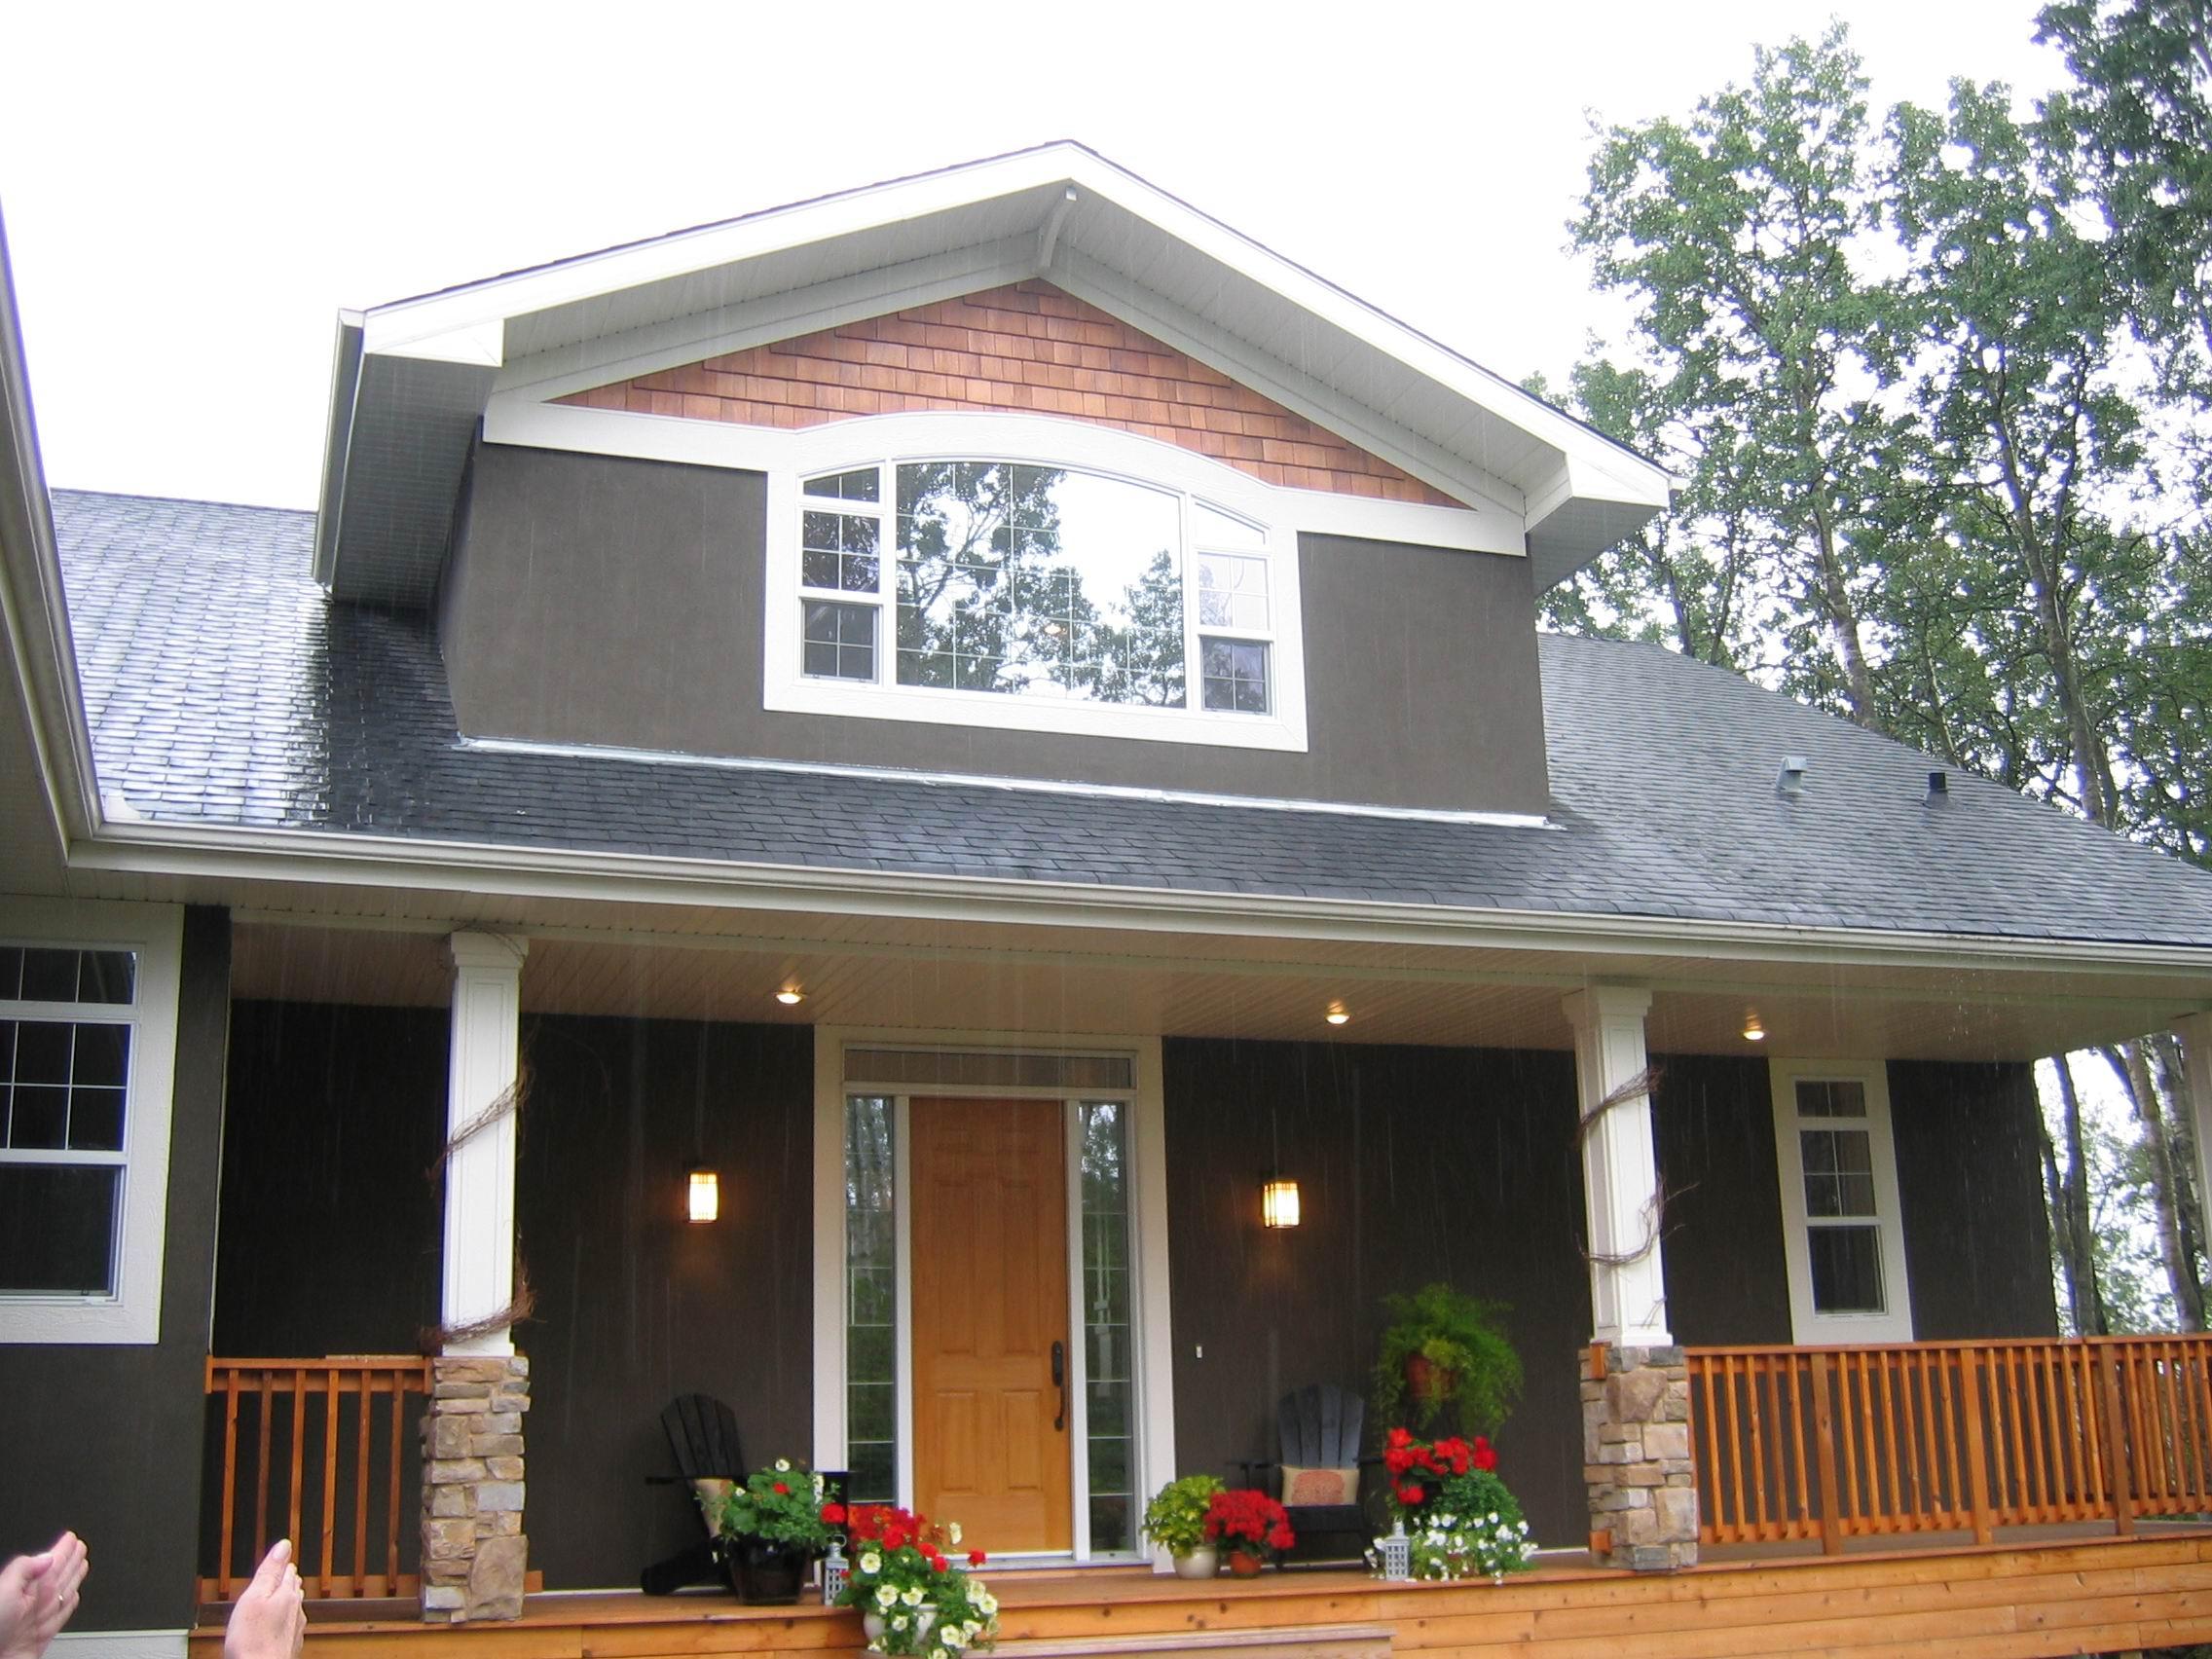 Craftsman fg 1720 robinson plans for Craftsman house plans canada